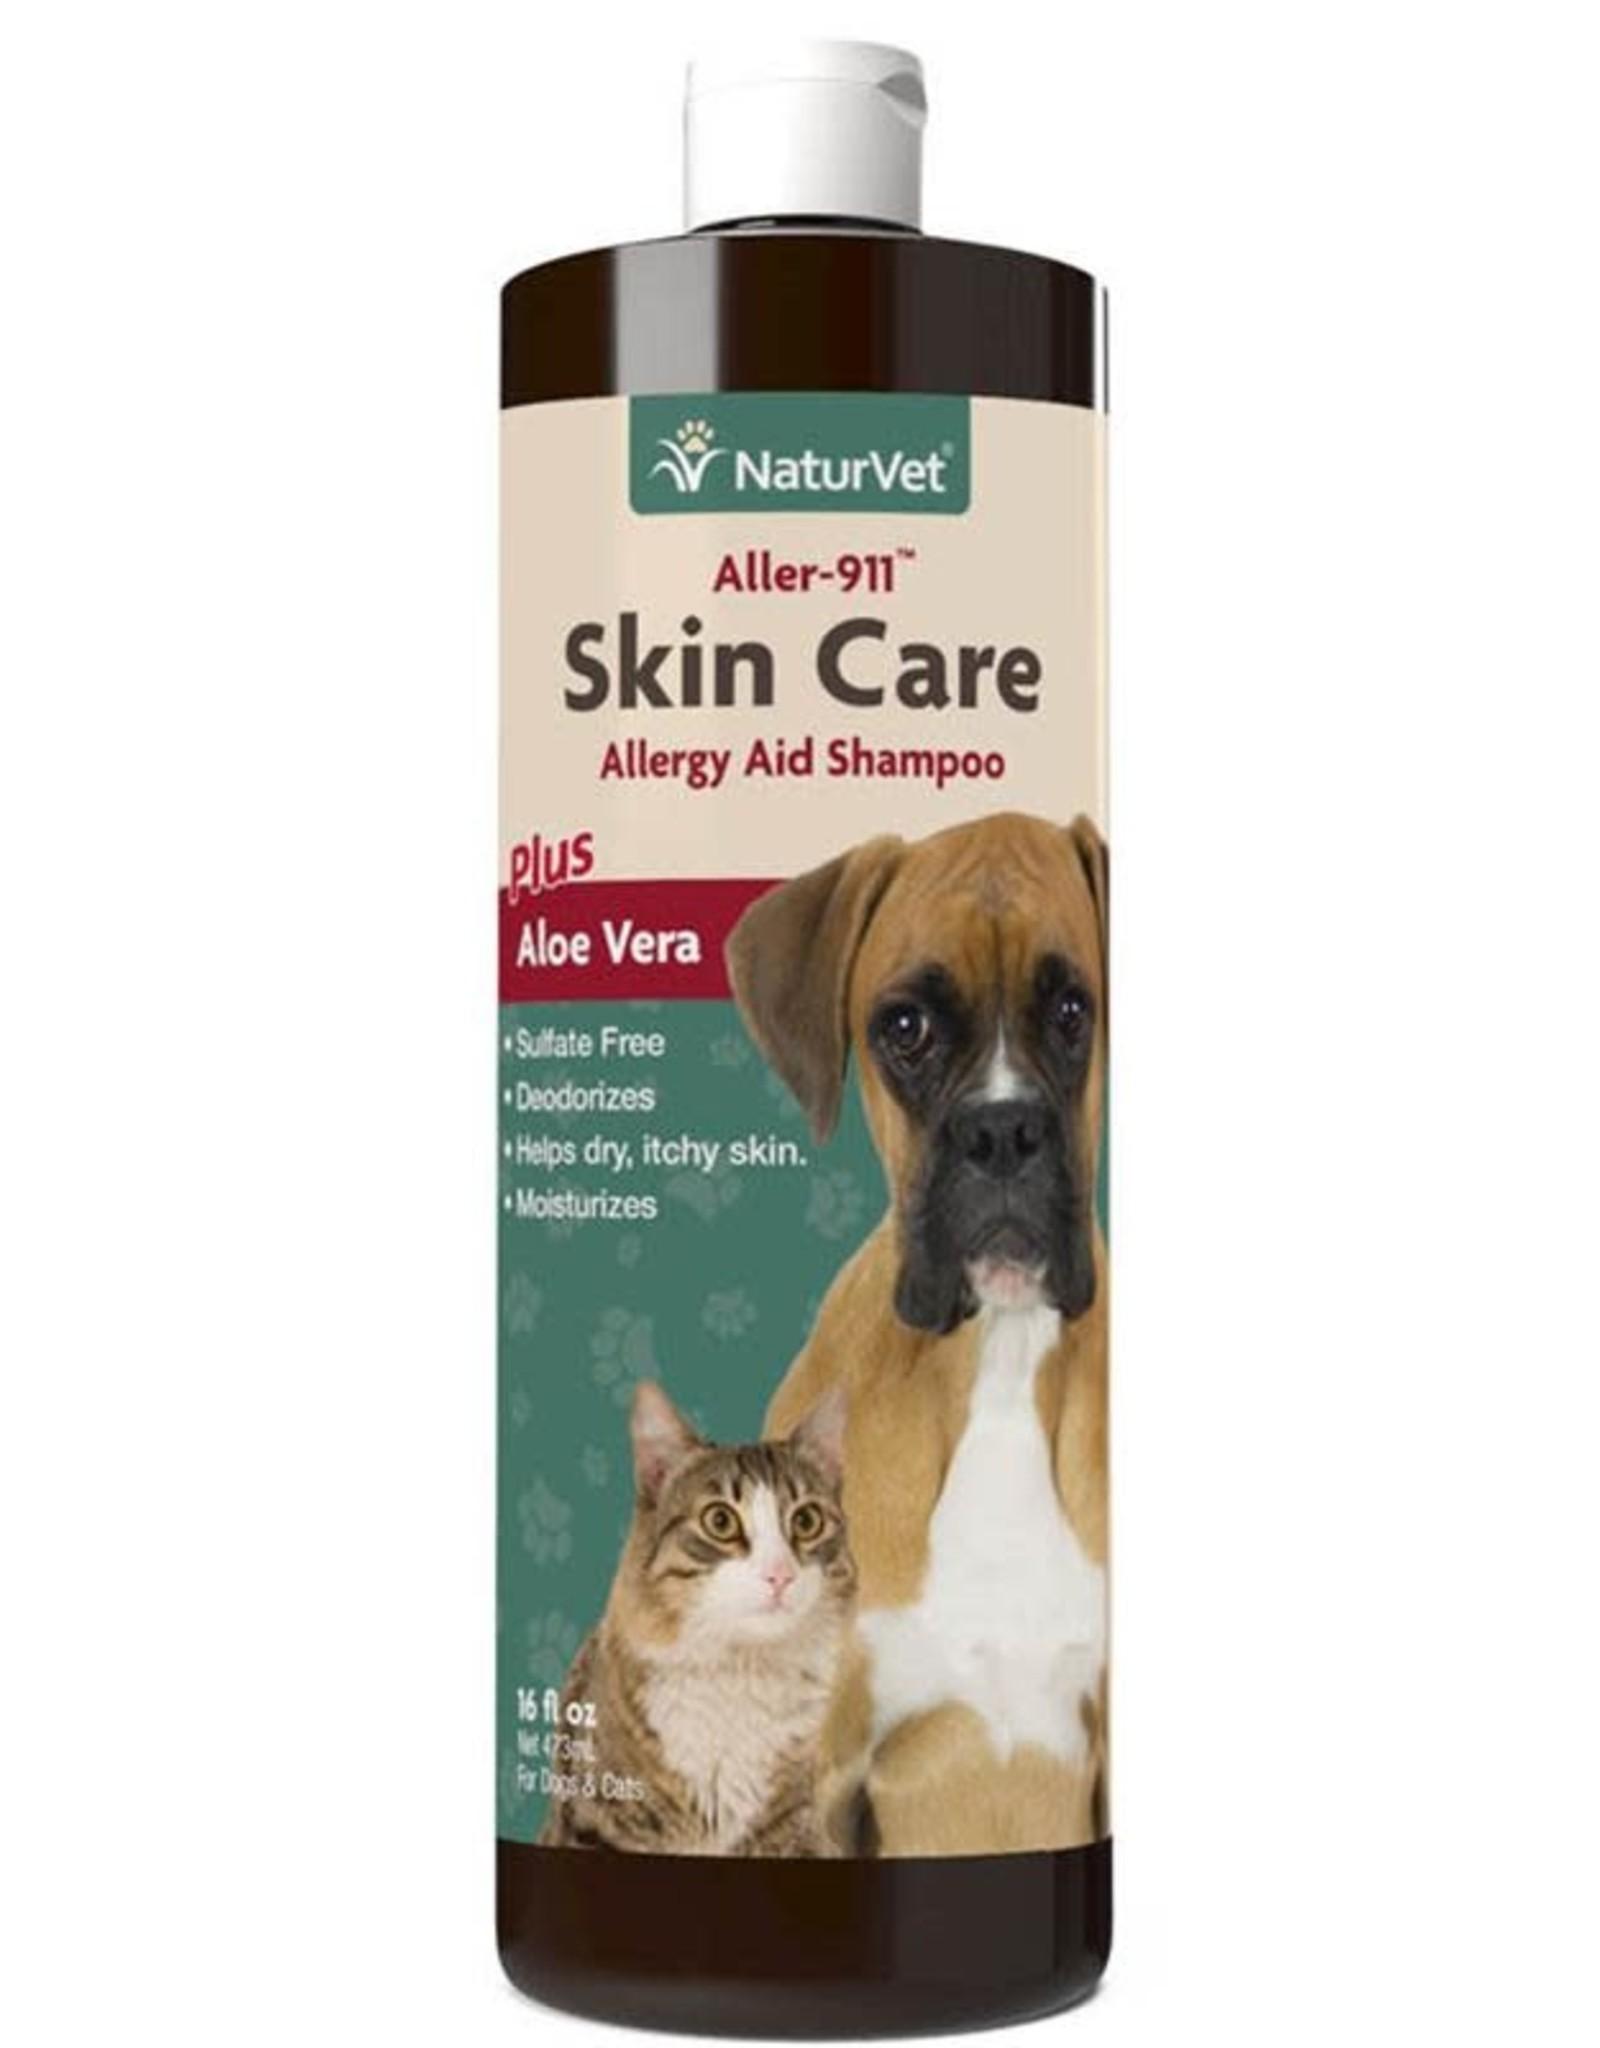 NaturVet Naturvet Aller-911 Skin Care Shampoo 16 oz